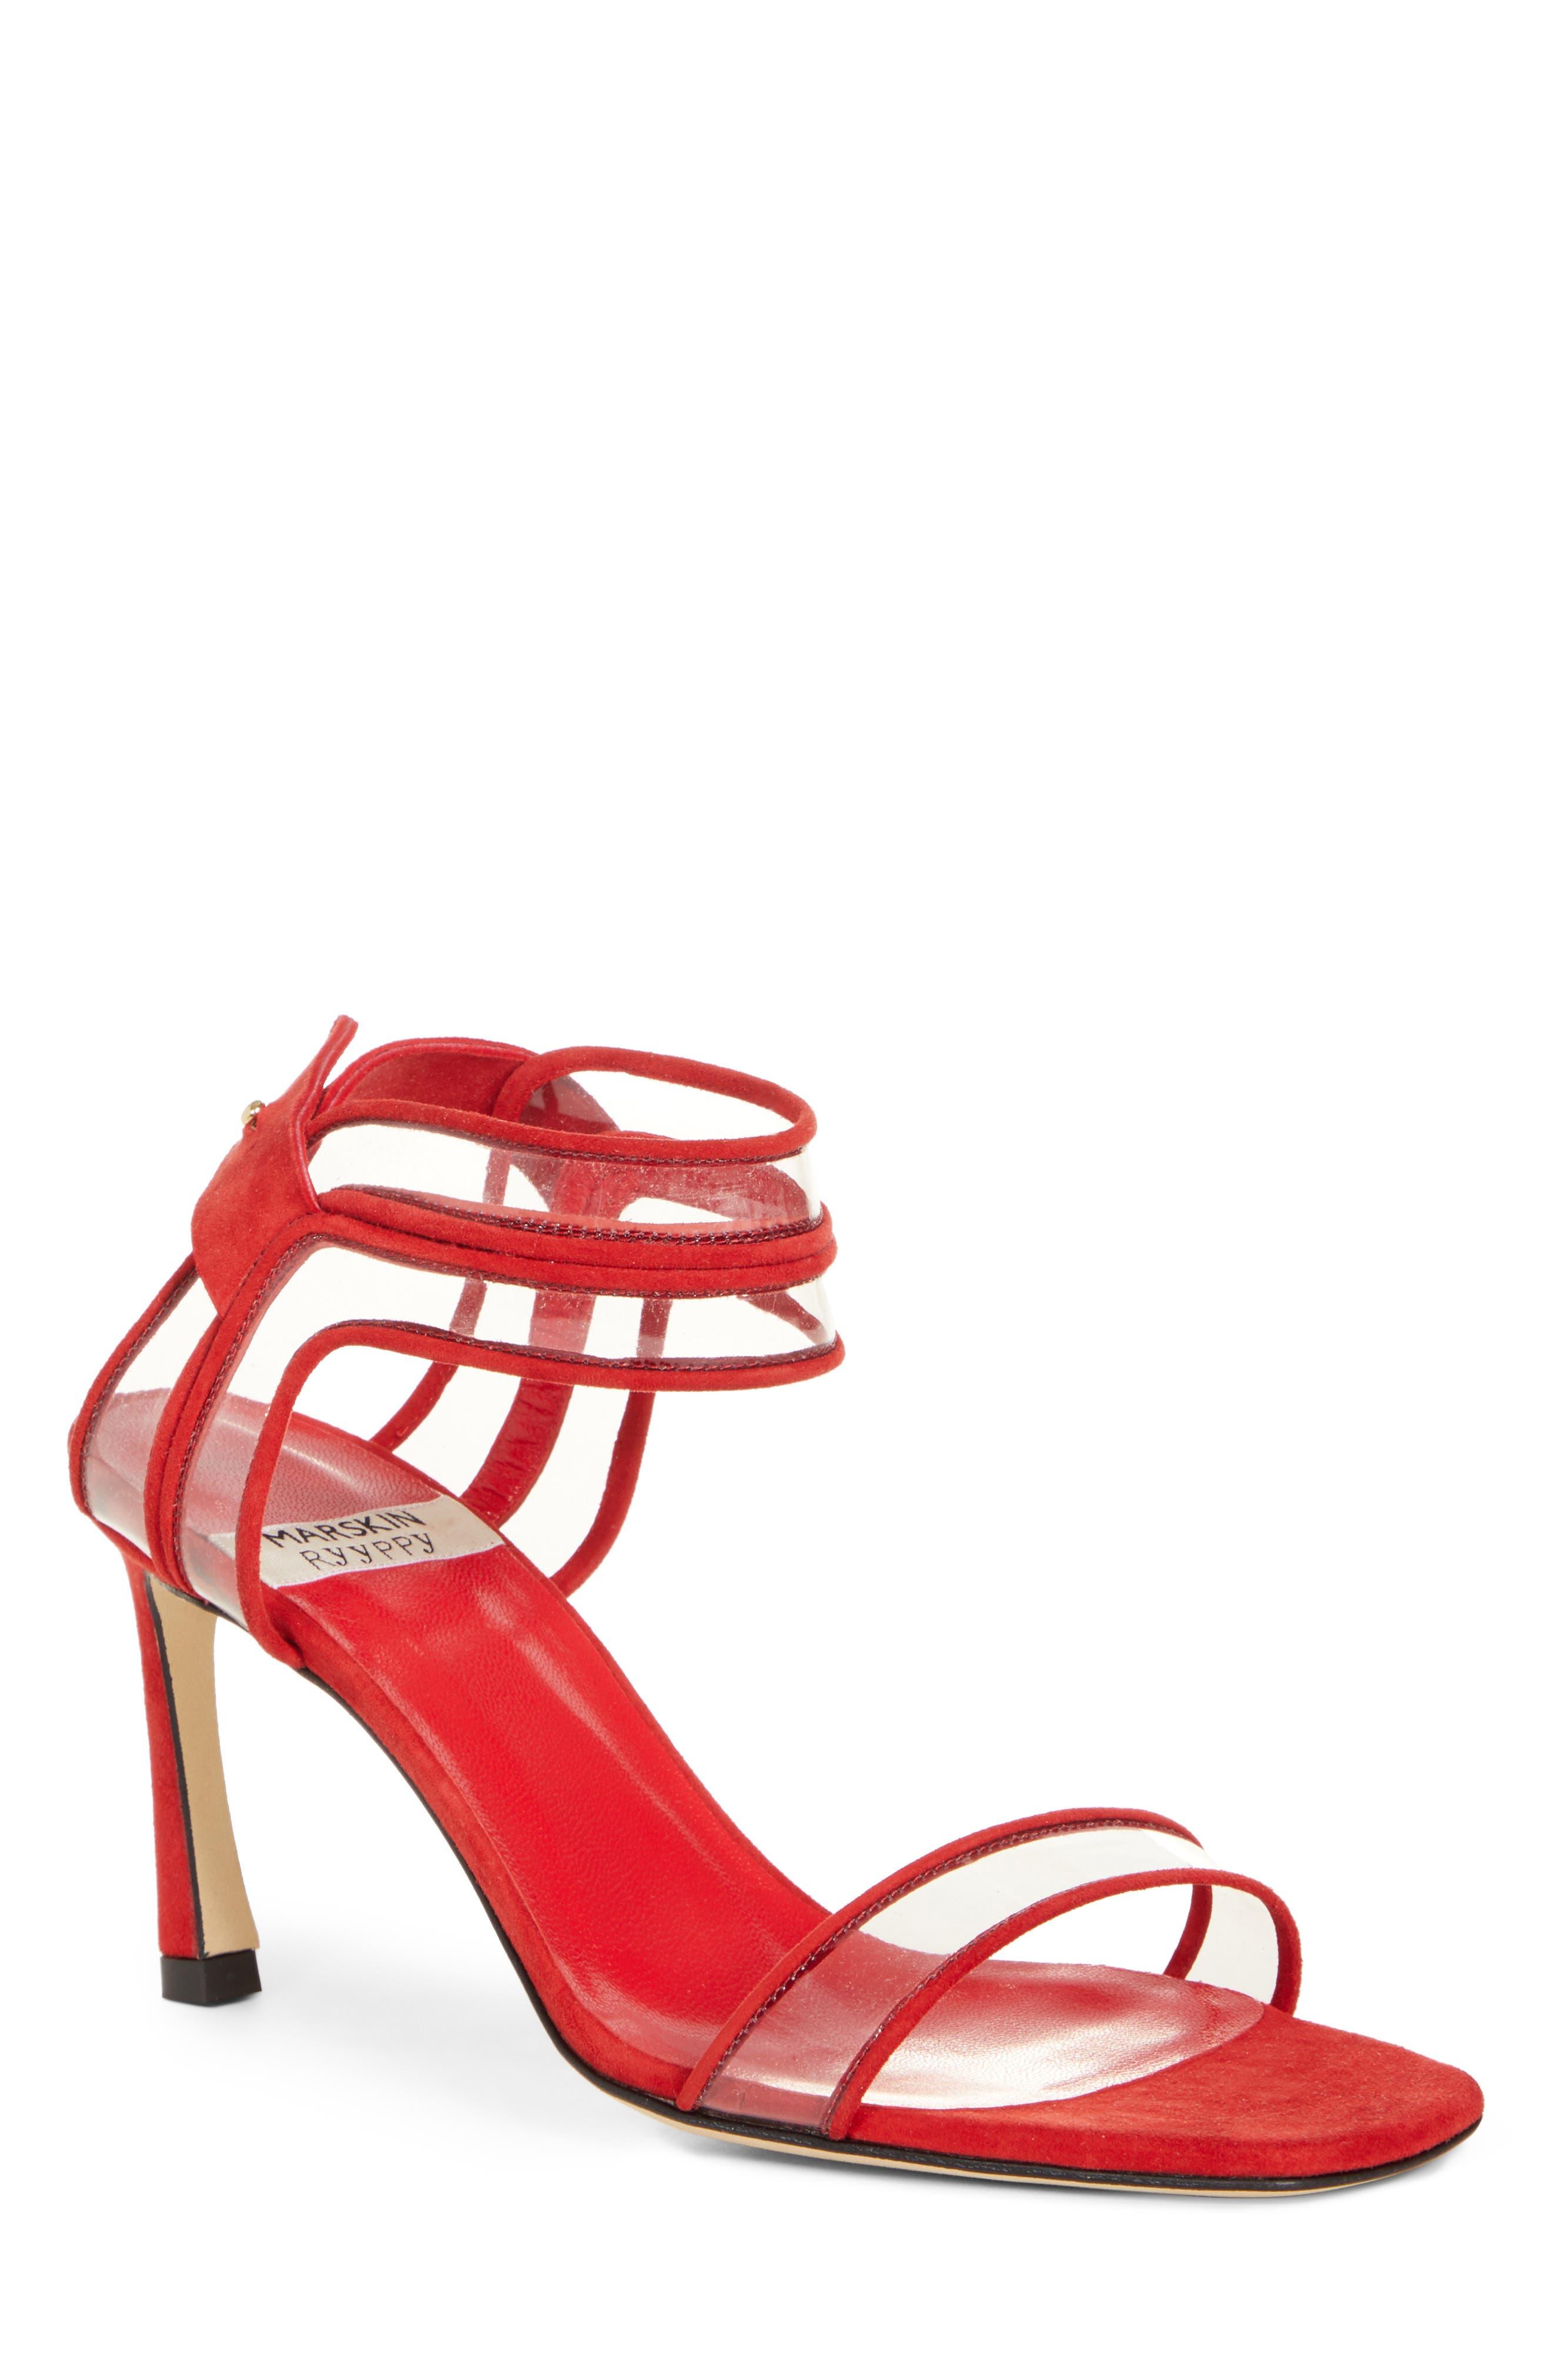 Winona Sandal, Main, color, IRON RED